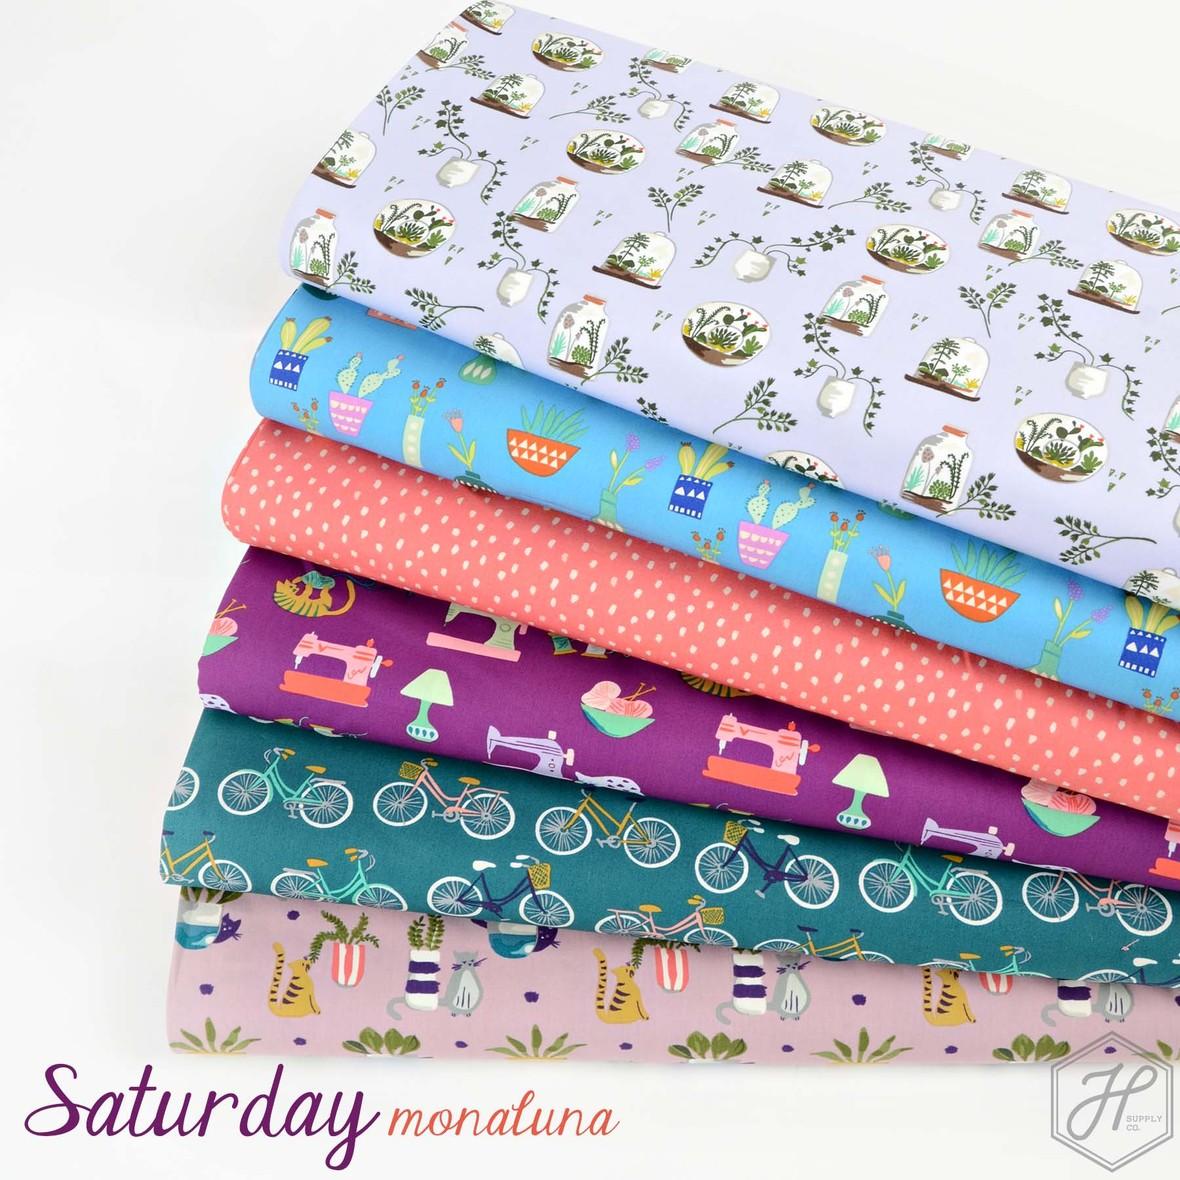 Saturday Fabric Monaluna at Hawthorne Supply Co